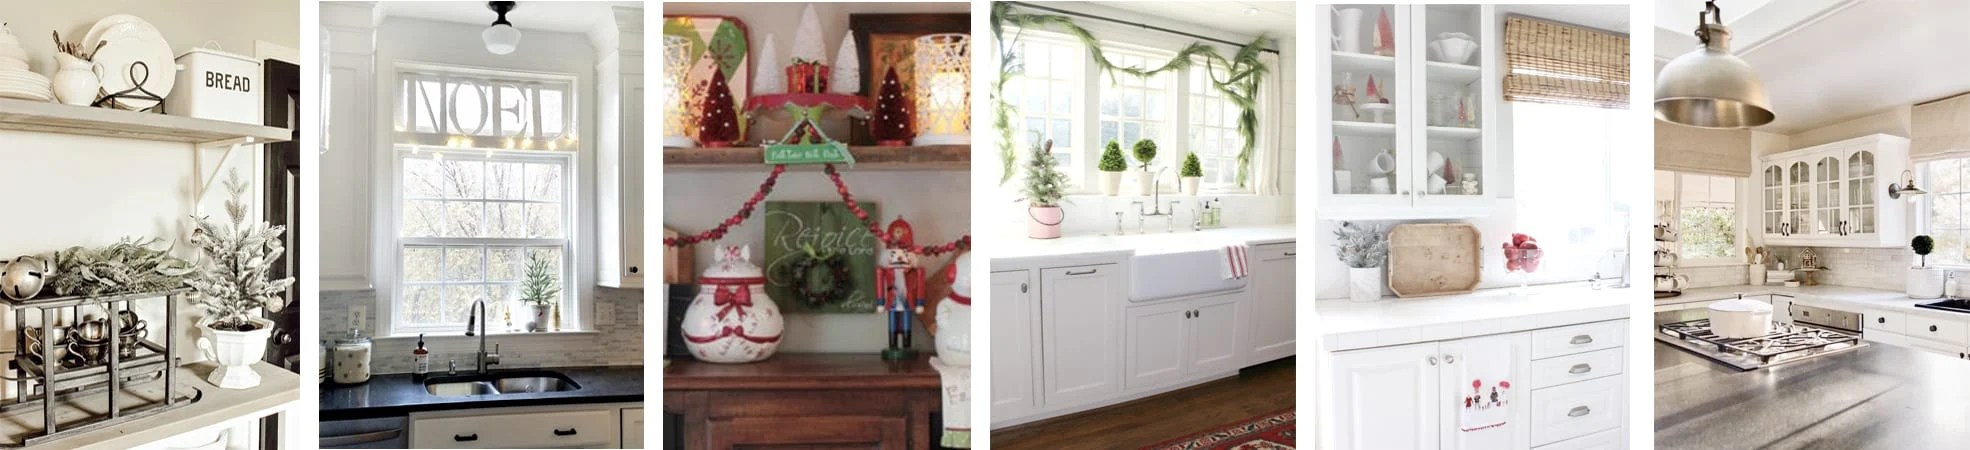 Tuesday christmas kitchen collage 2